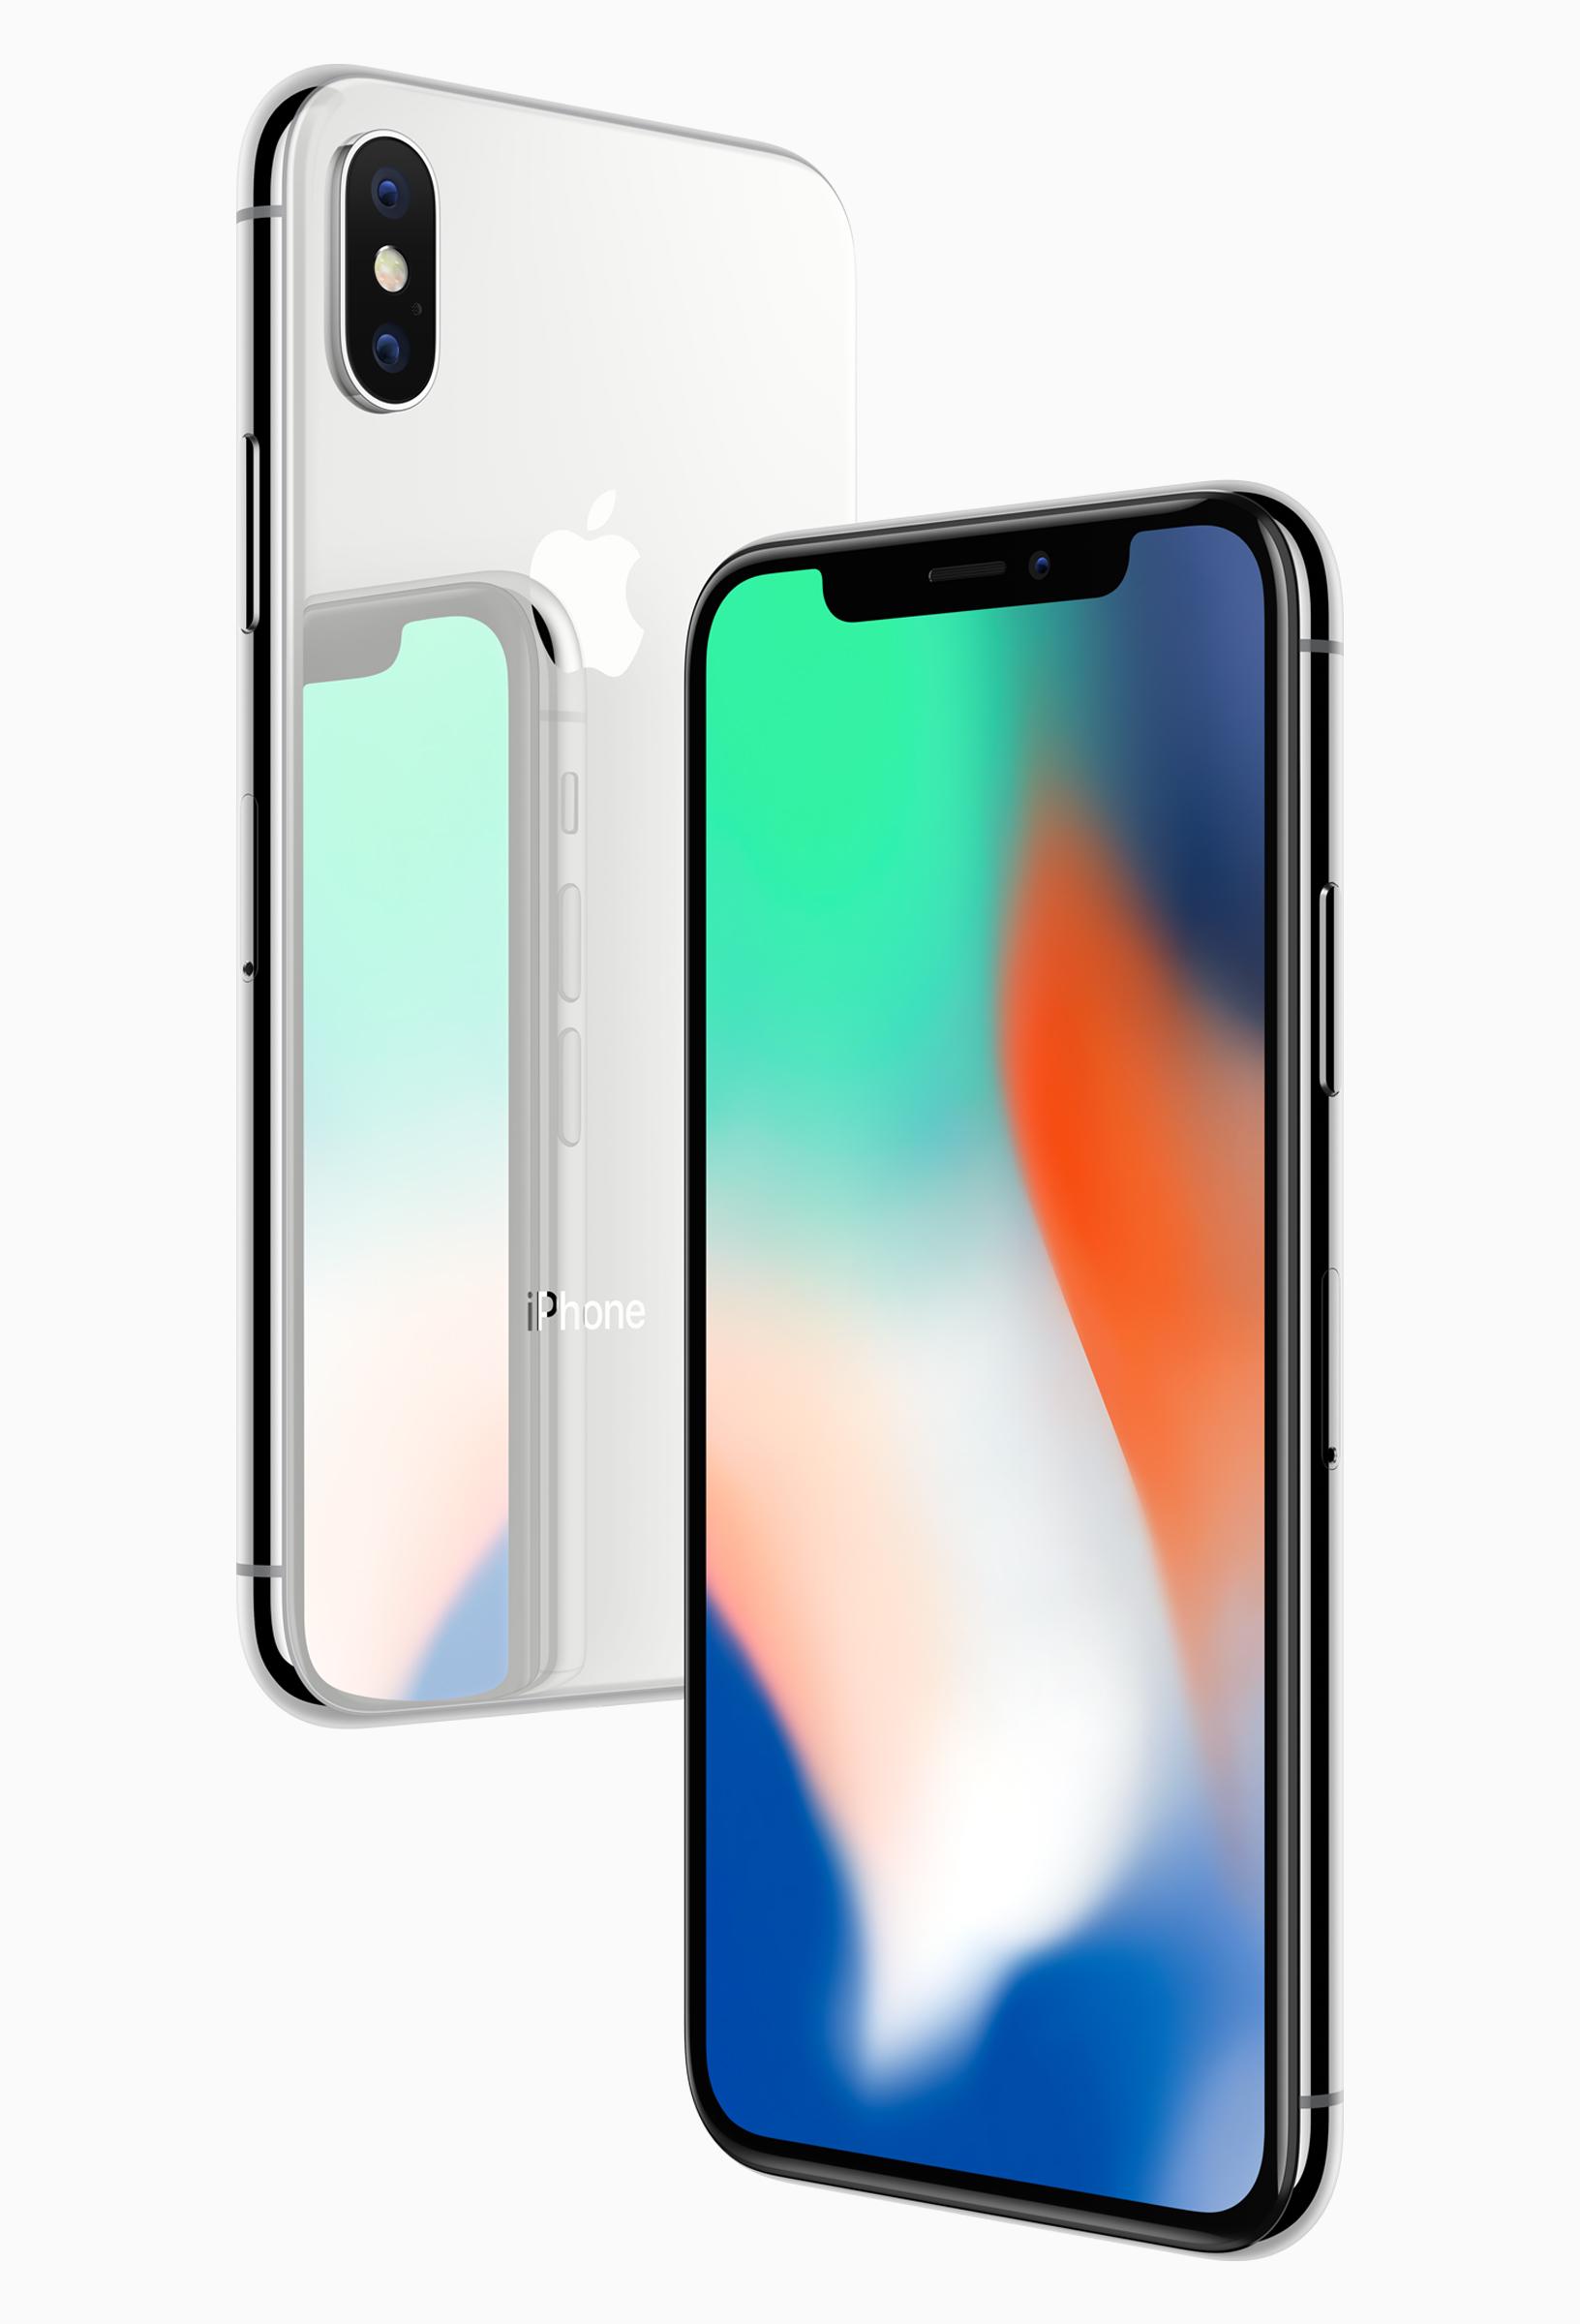 Iphone 8 Iphone 8 Plus Iphone X Caractéristiques